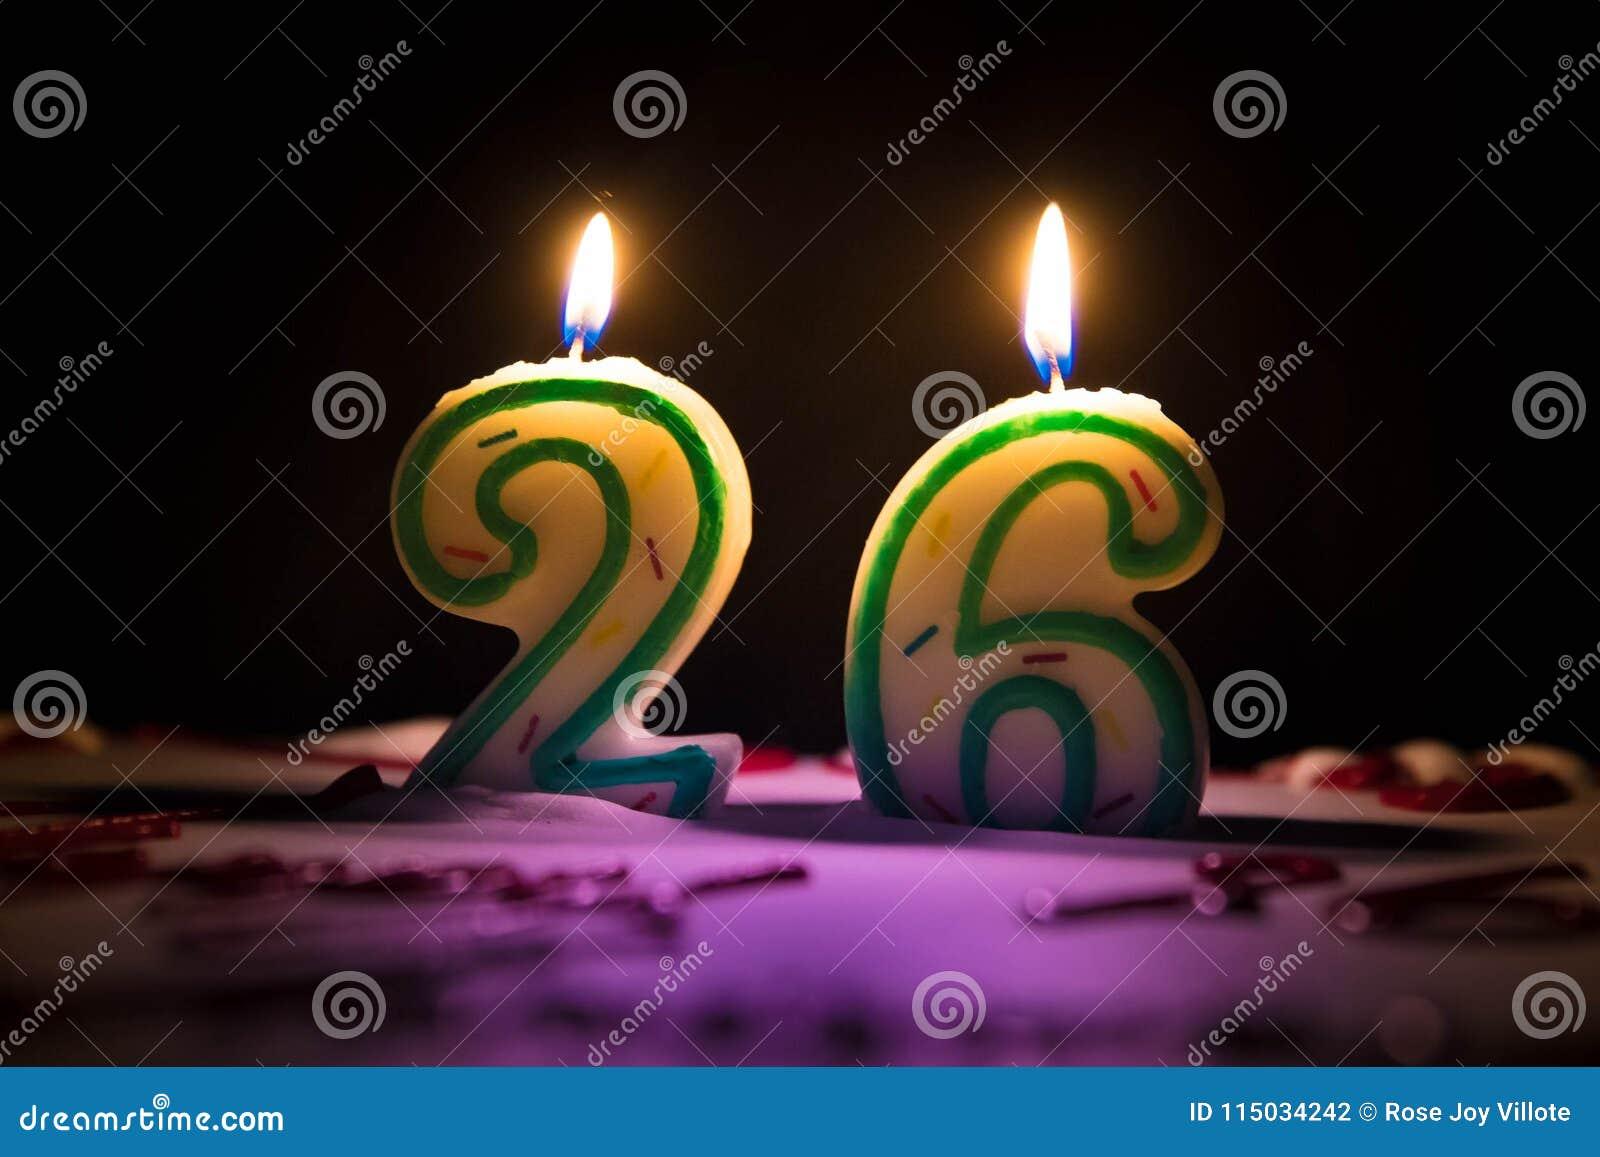 Candle Number 26 Twenty Six Stock Photo Image Of Message Save